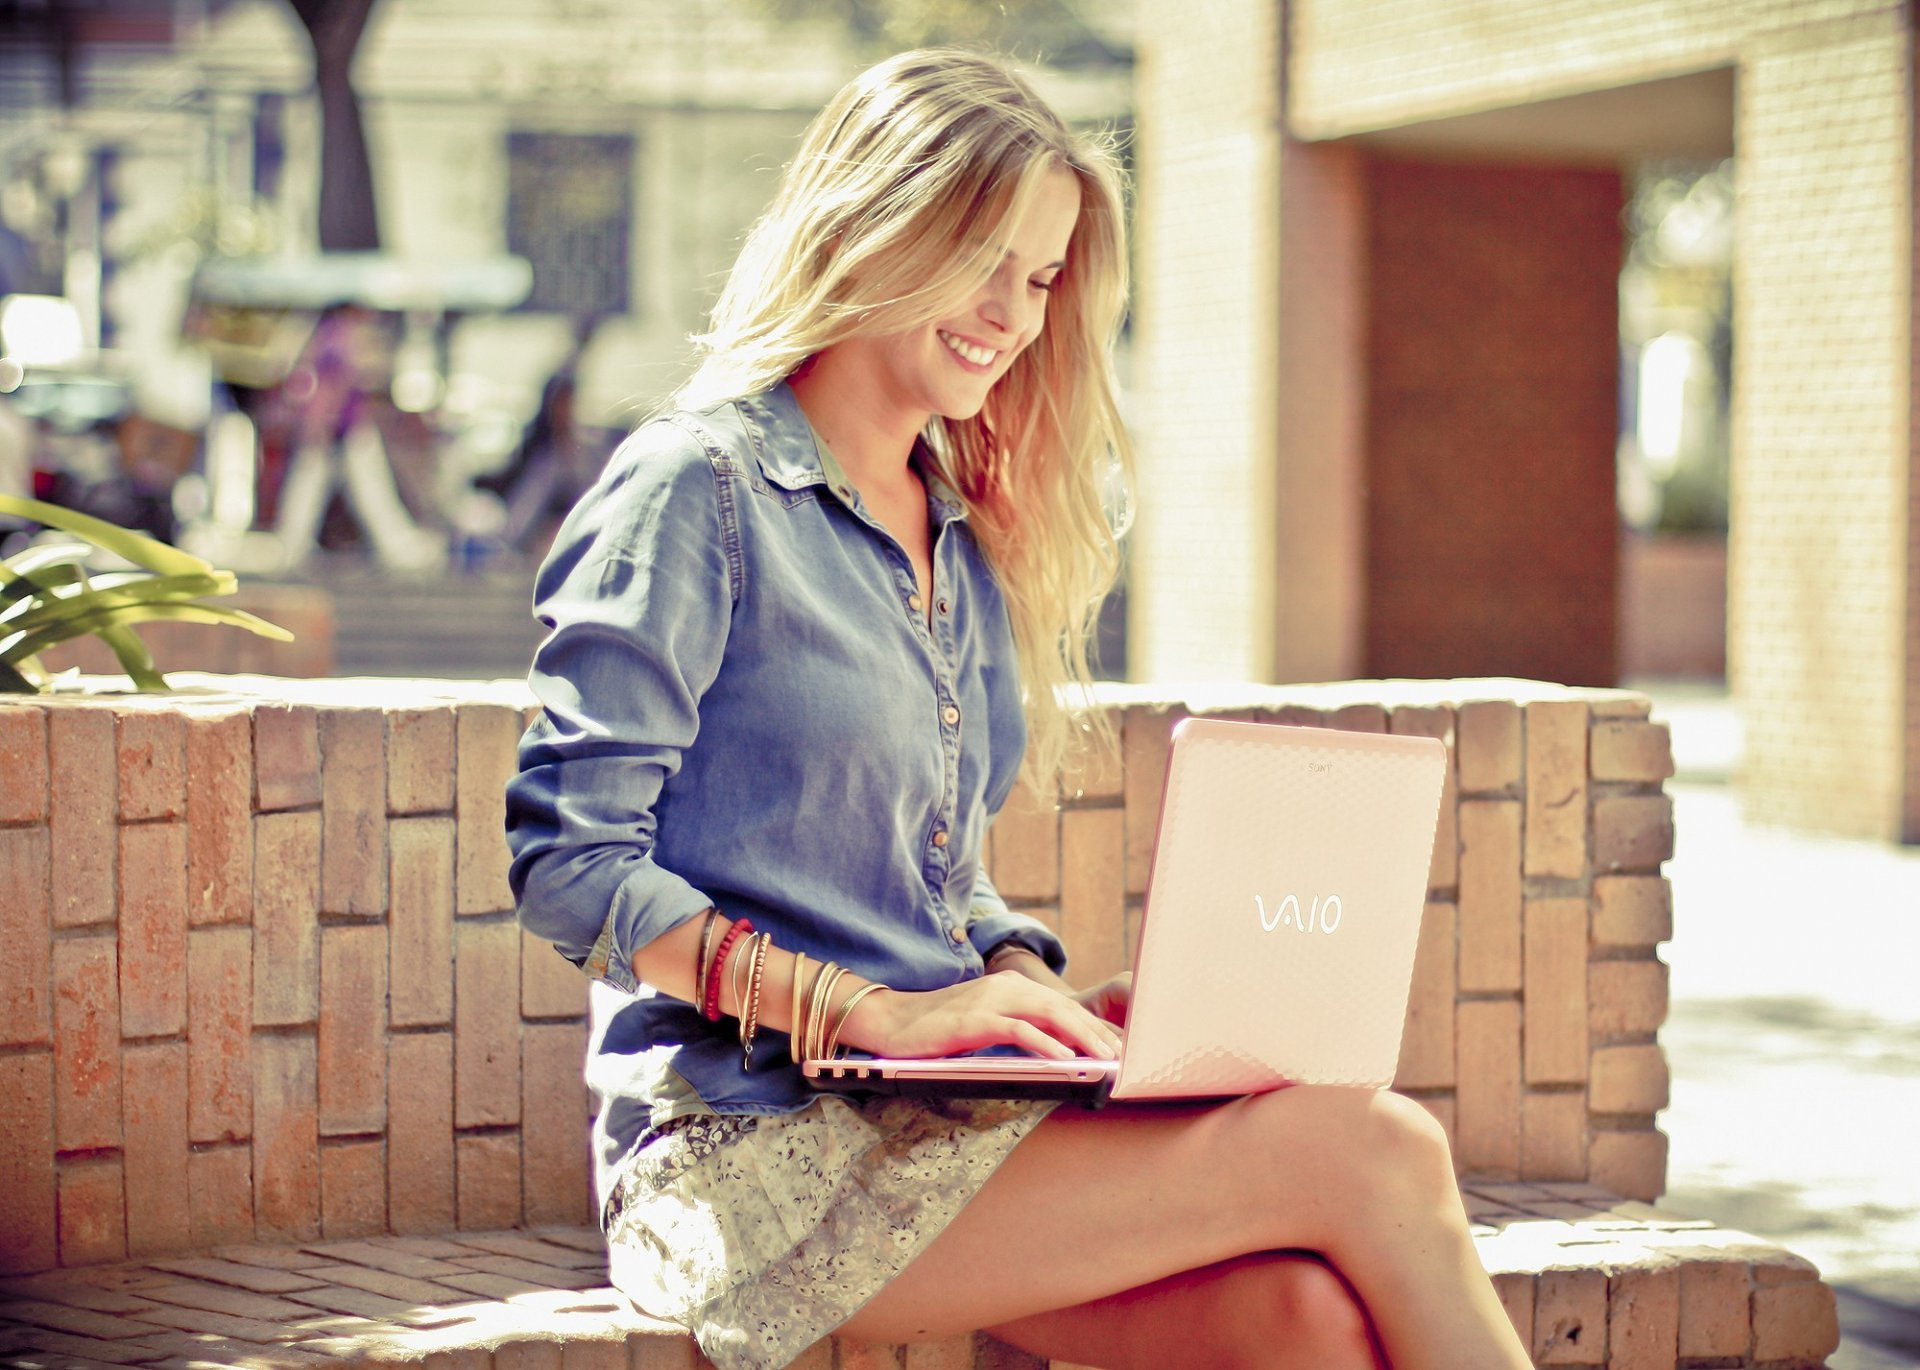 Фото на рабочий стол для ноутбука для девушки